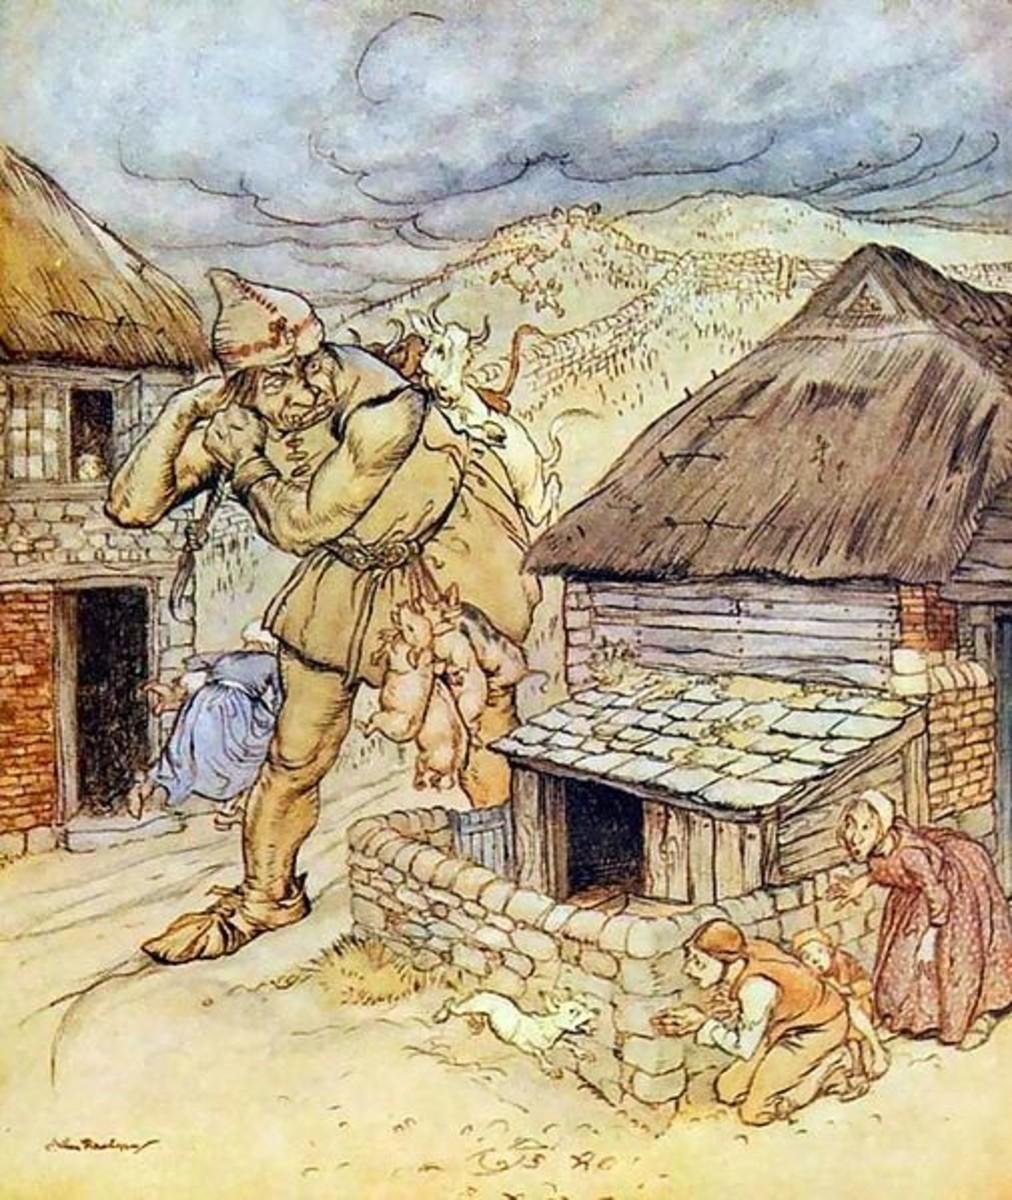 British Giant (Arthur Rackham)